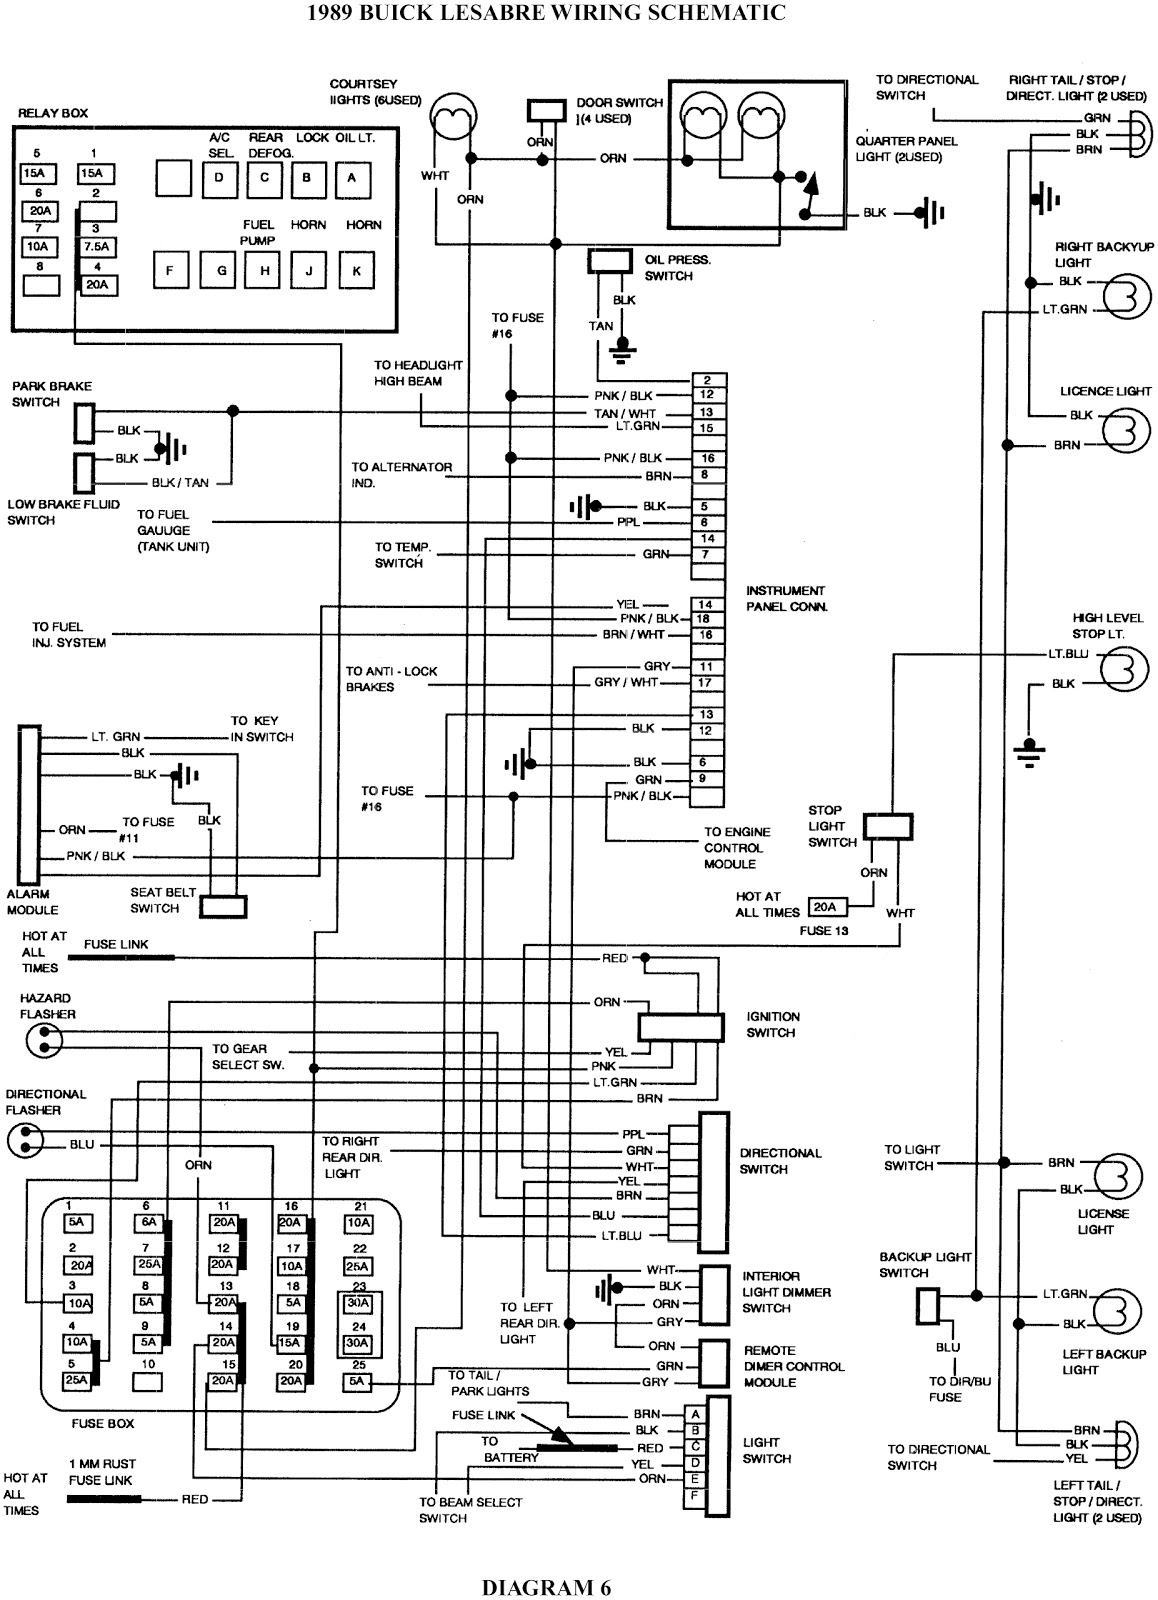 2002 buick lesabre engine wiring diagram